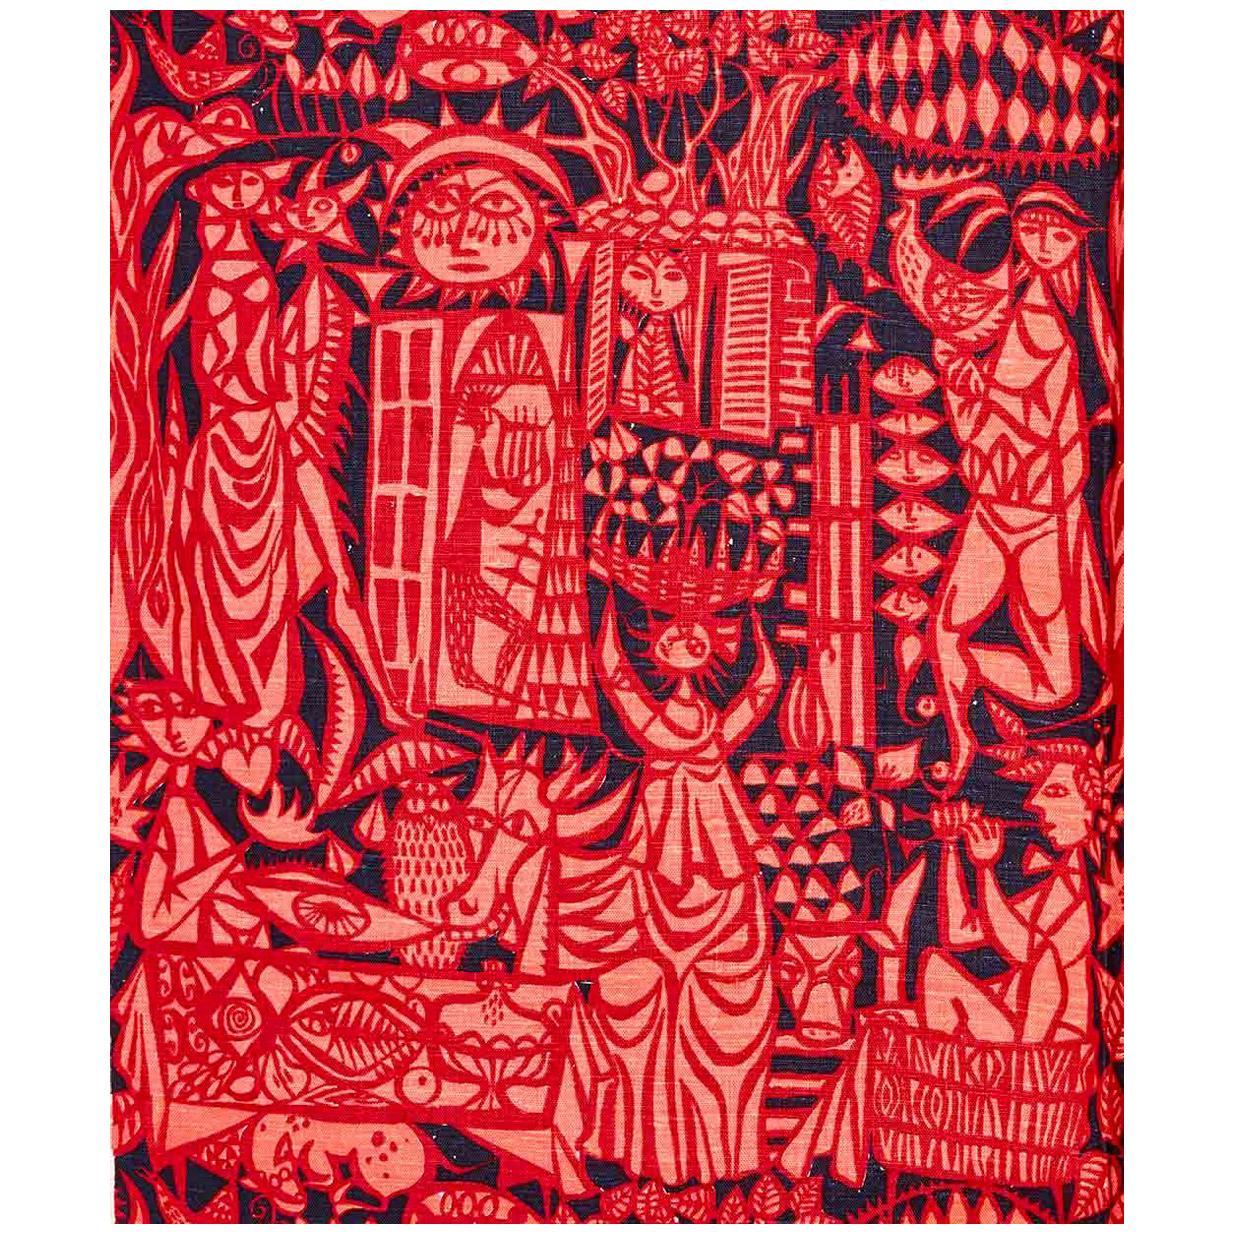 """Comedia"" Textile by Stig Lindberg"